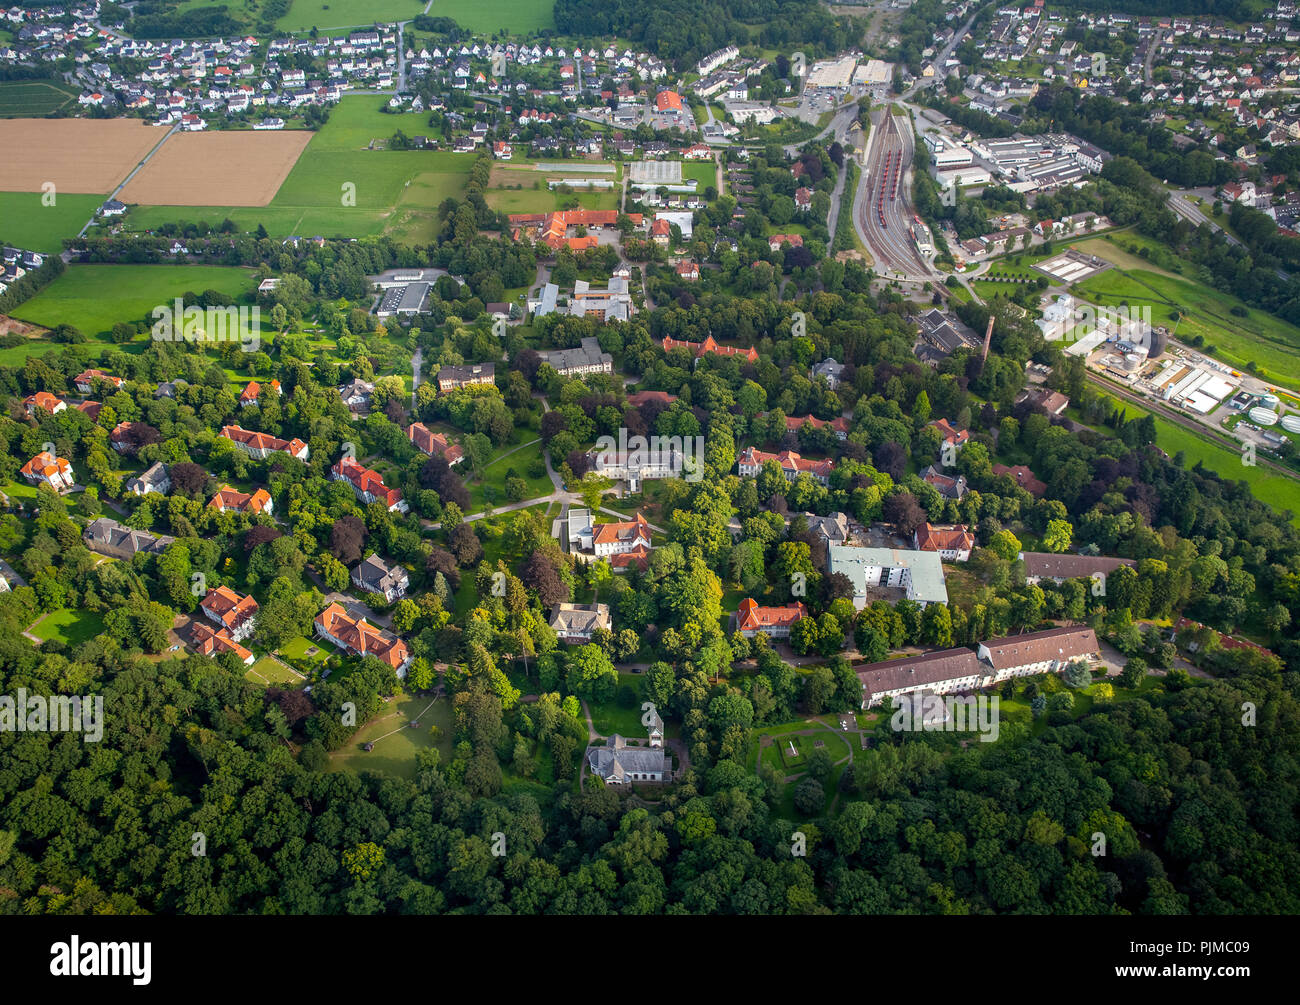 At the LWL Clinic Warstein, LWL Clinic Warstein for Psychiatry, Psychotherapy and Psychosomatics, Landschaftsverband Westfalen-Lippe, Warstein, district Soest, North Rhine-Westphalia, Germany - Stock Image